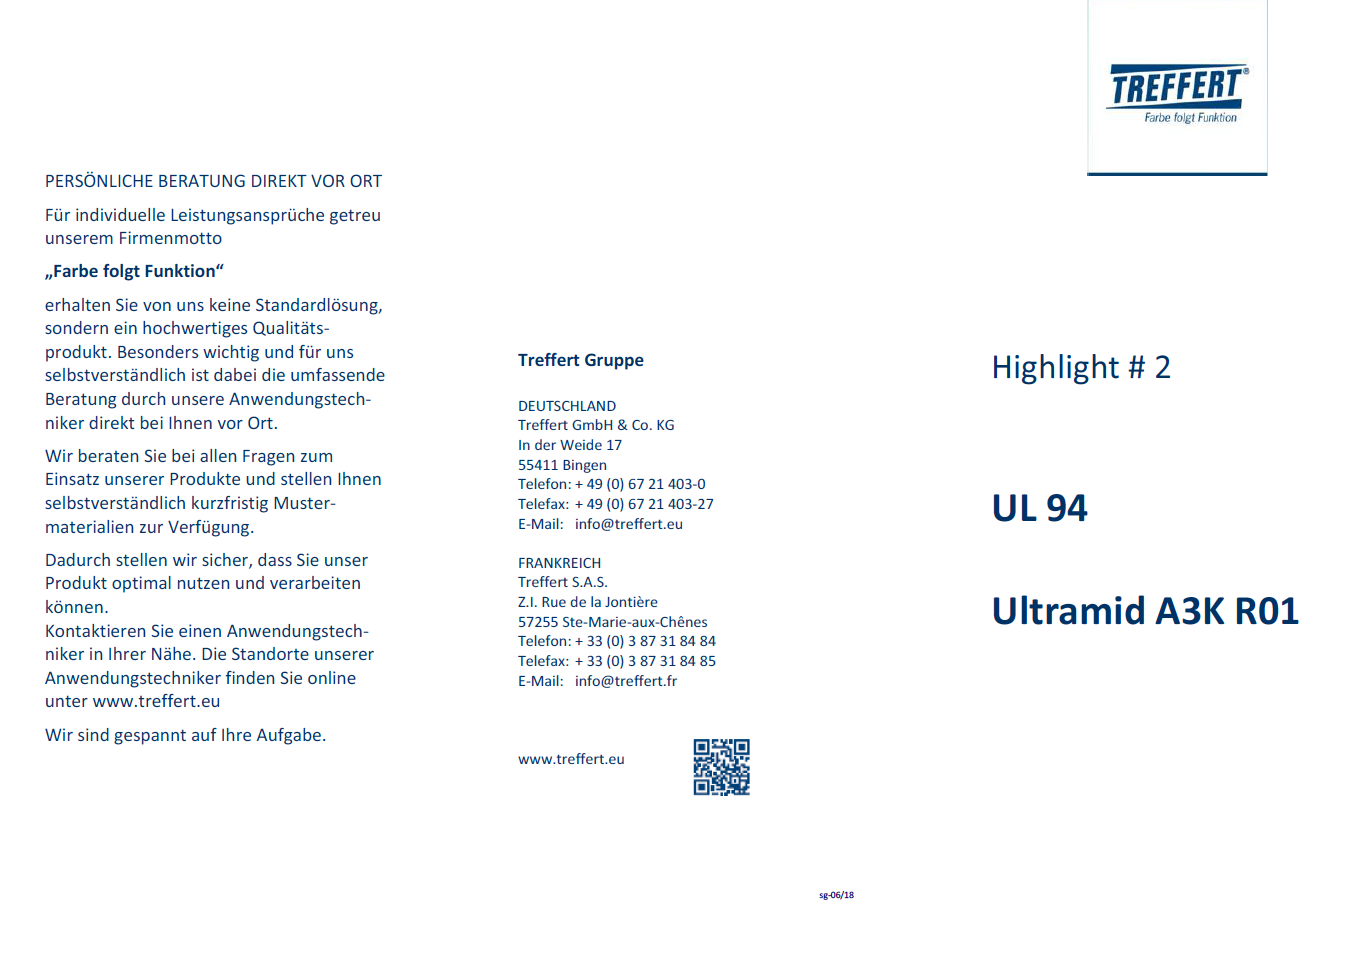 Broschüre UL94 Ultramid A3K R01 von Treffert